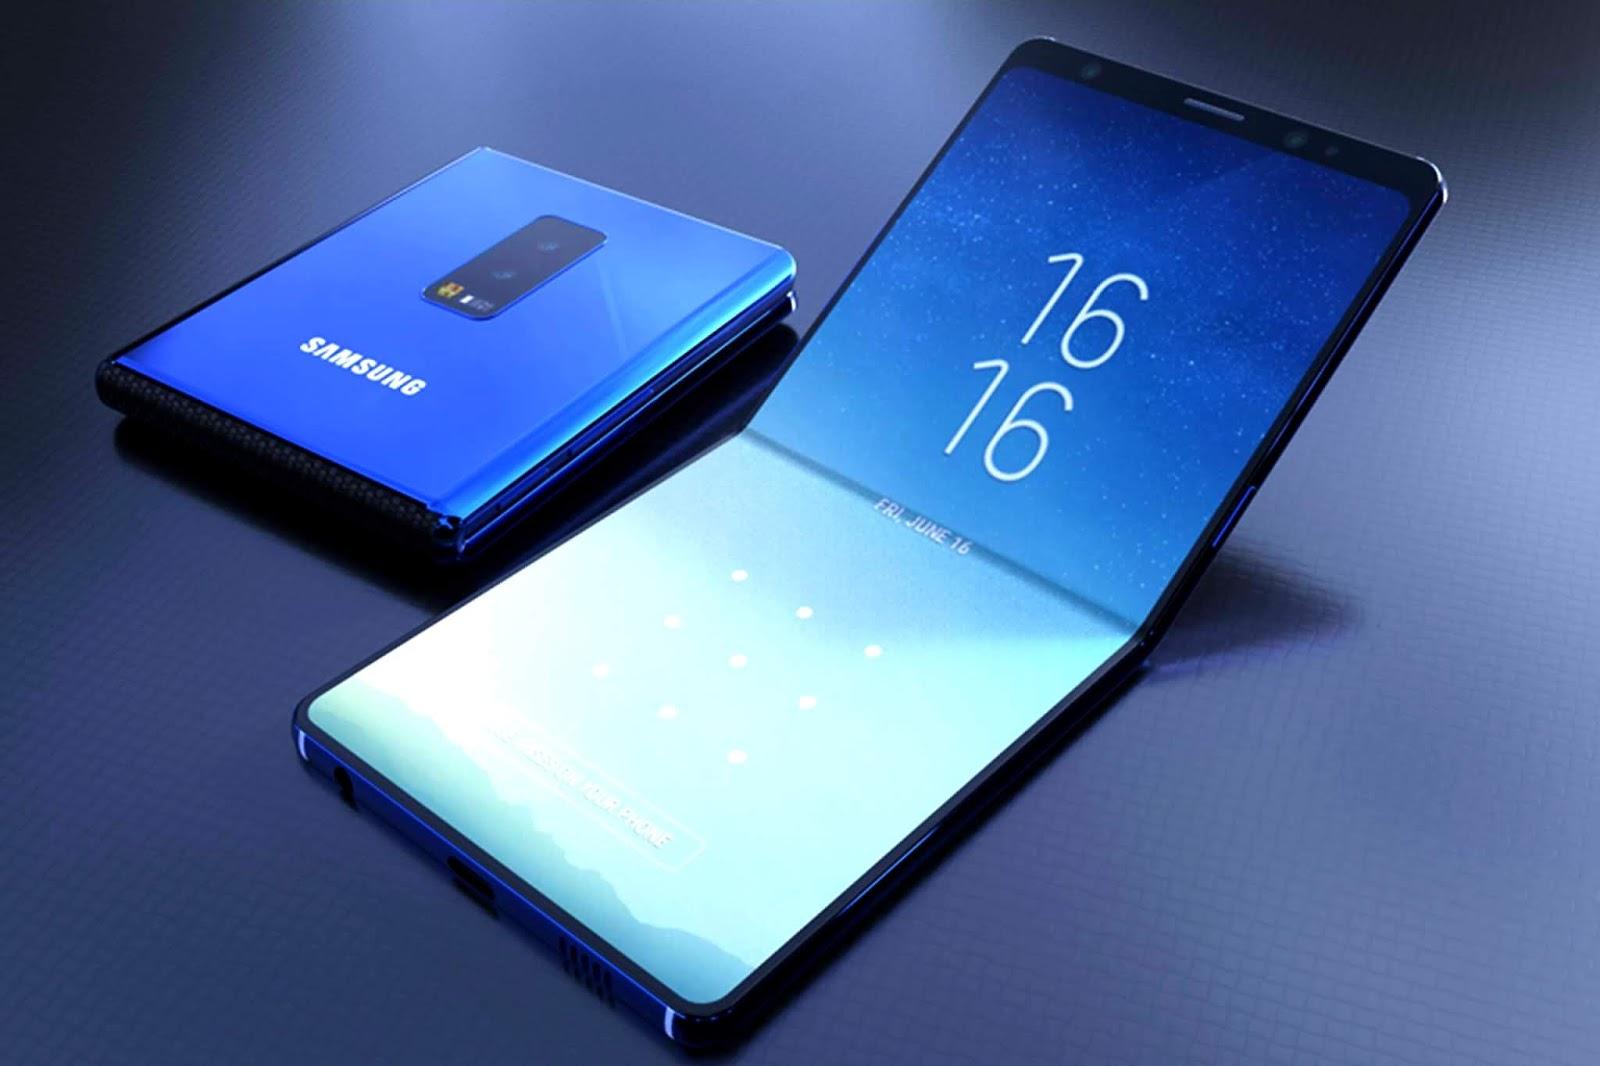 سامسونغ تخطط لإطلاق هاتف صدفي قابل للطي